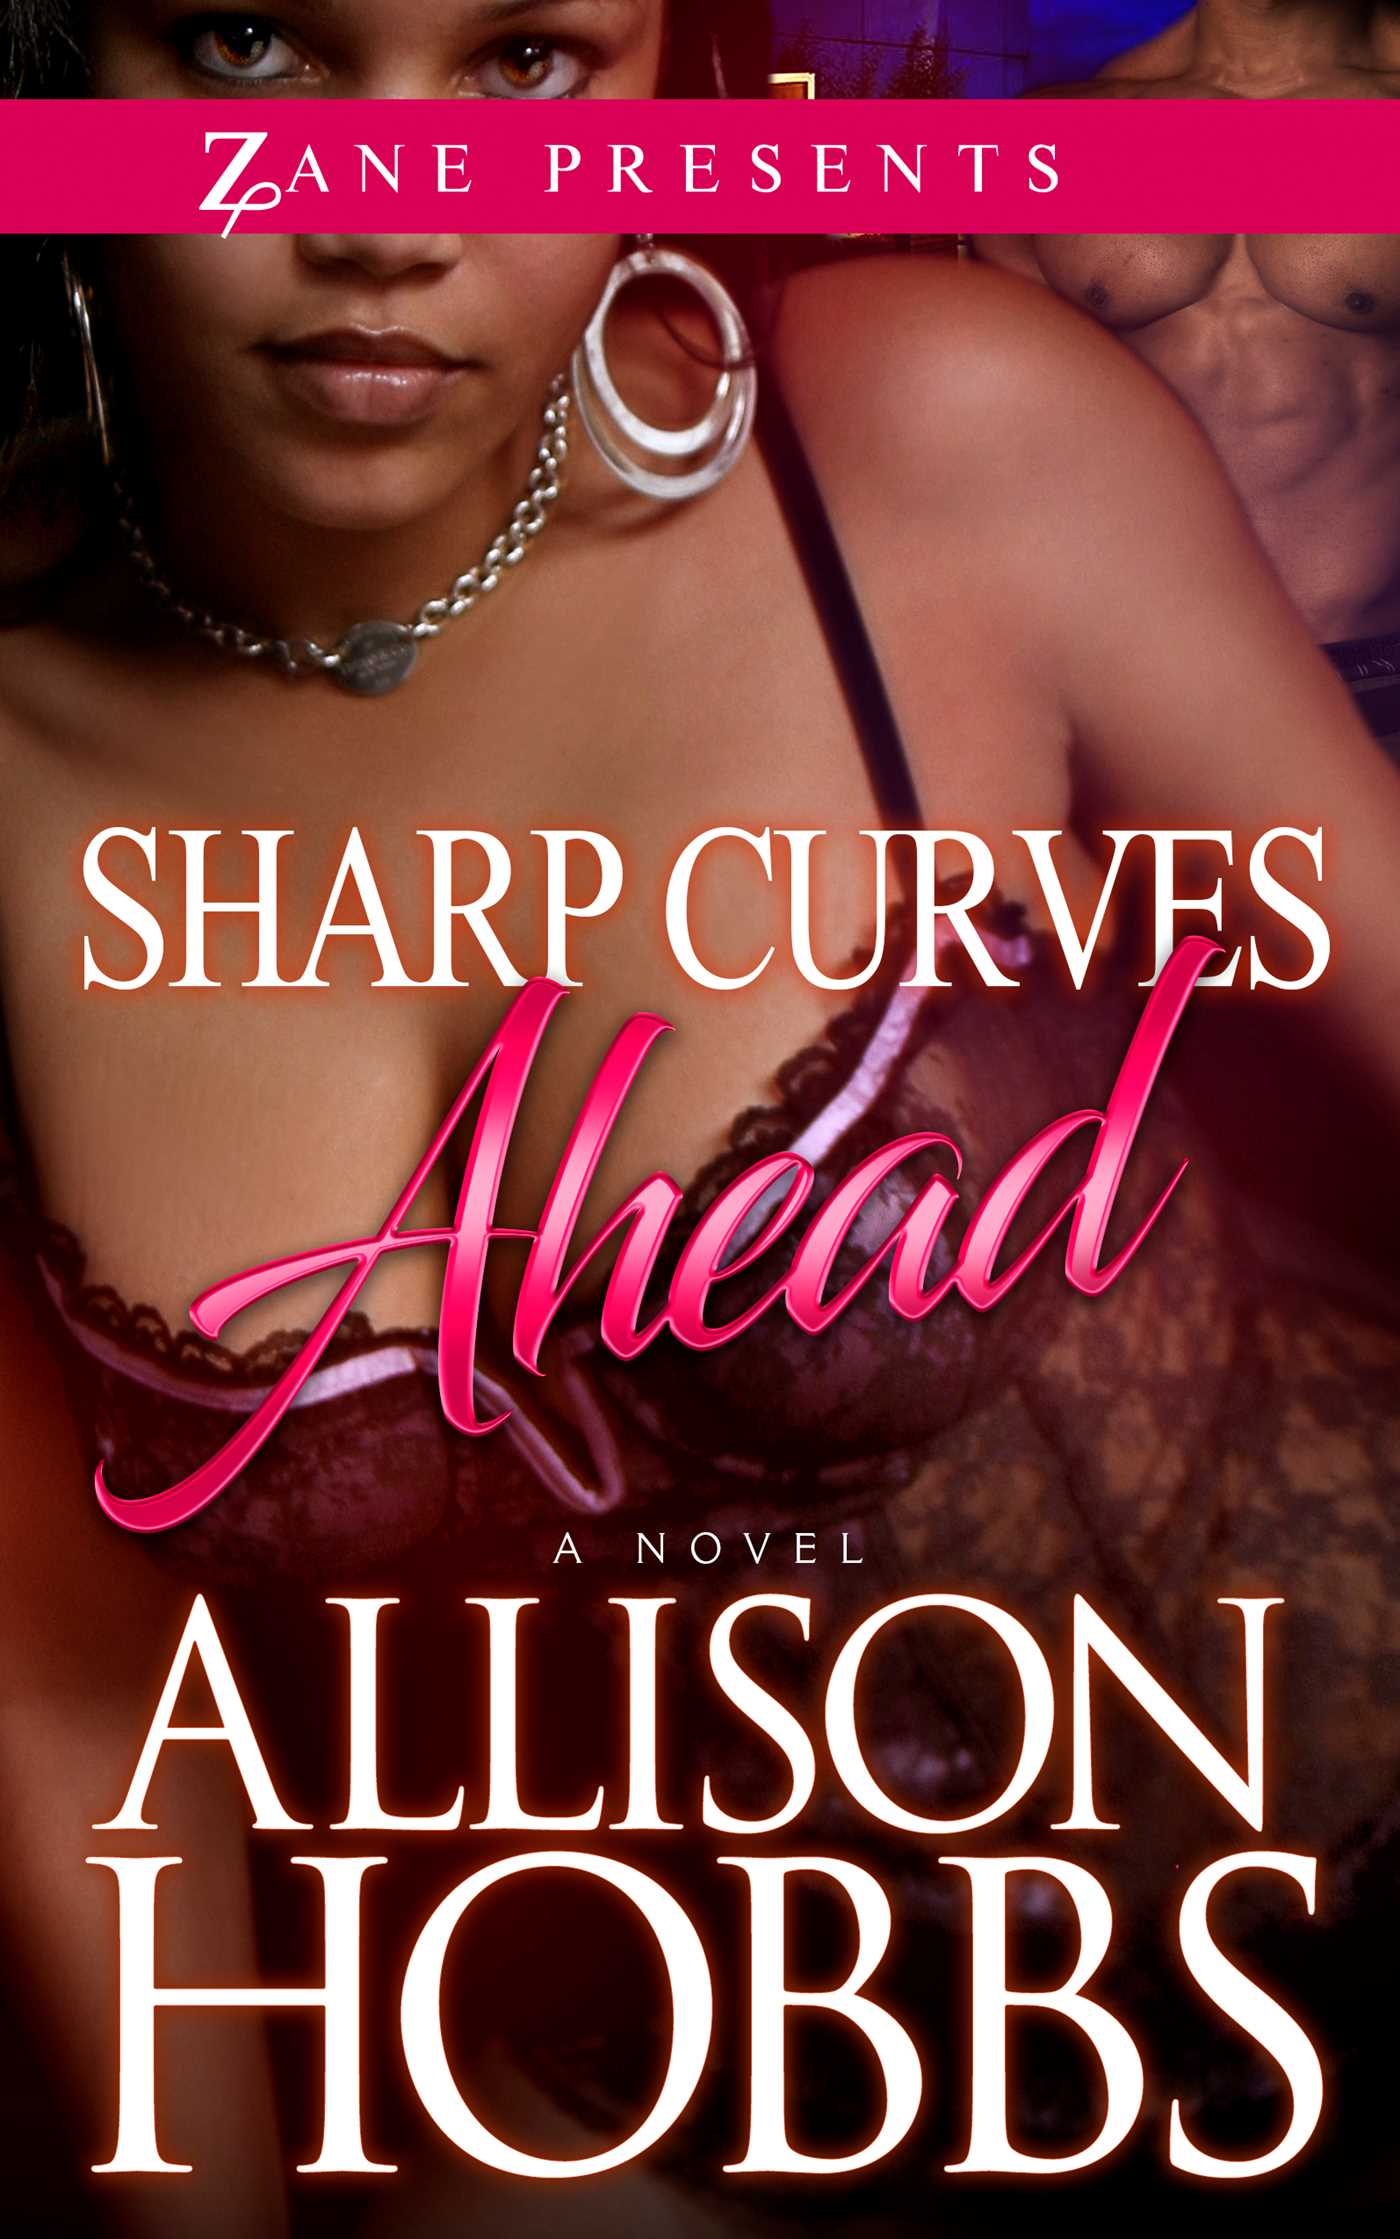 Sharp curves ahead 9781593096762 hr